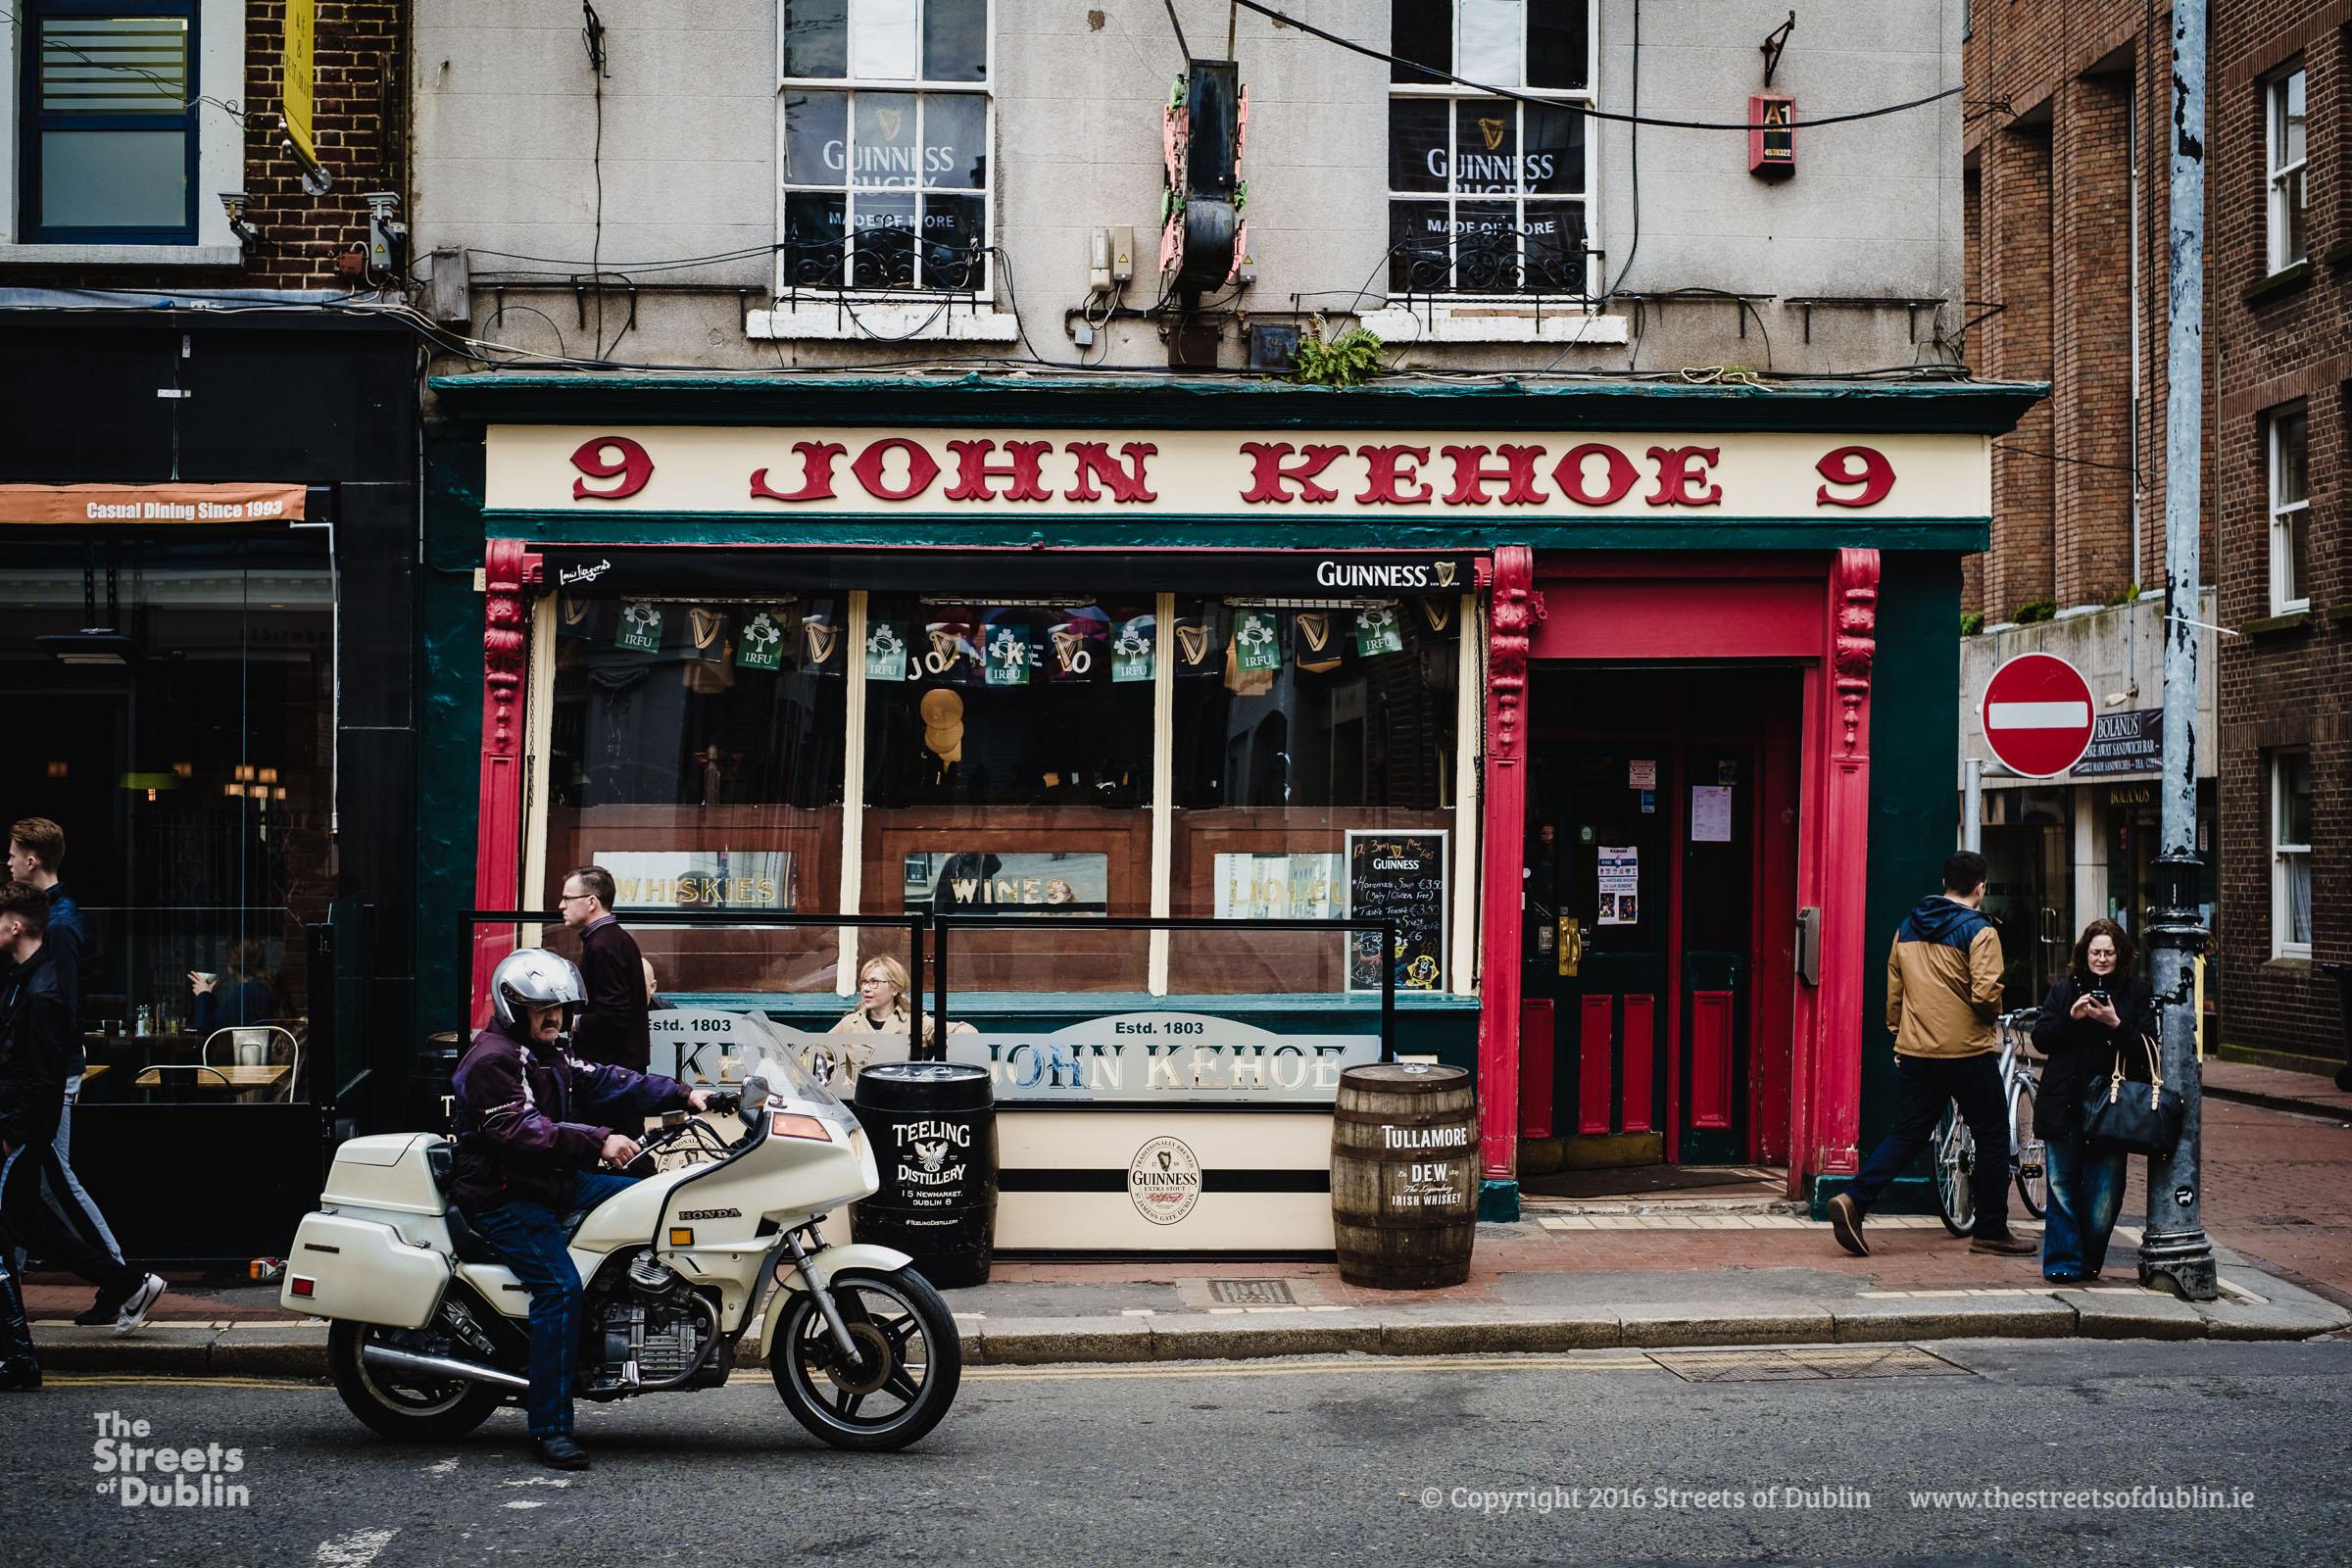 Streets-of-Dublin-Photo-2009.jpg